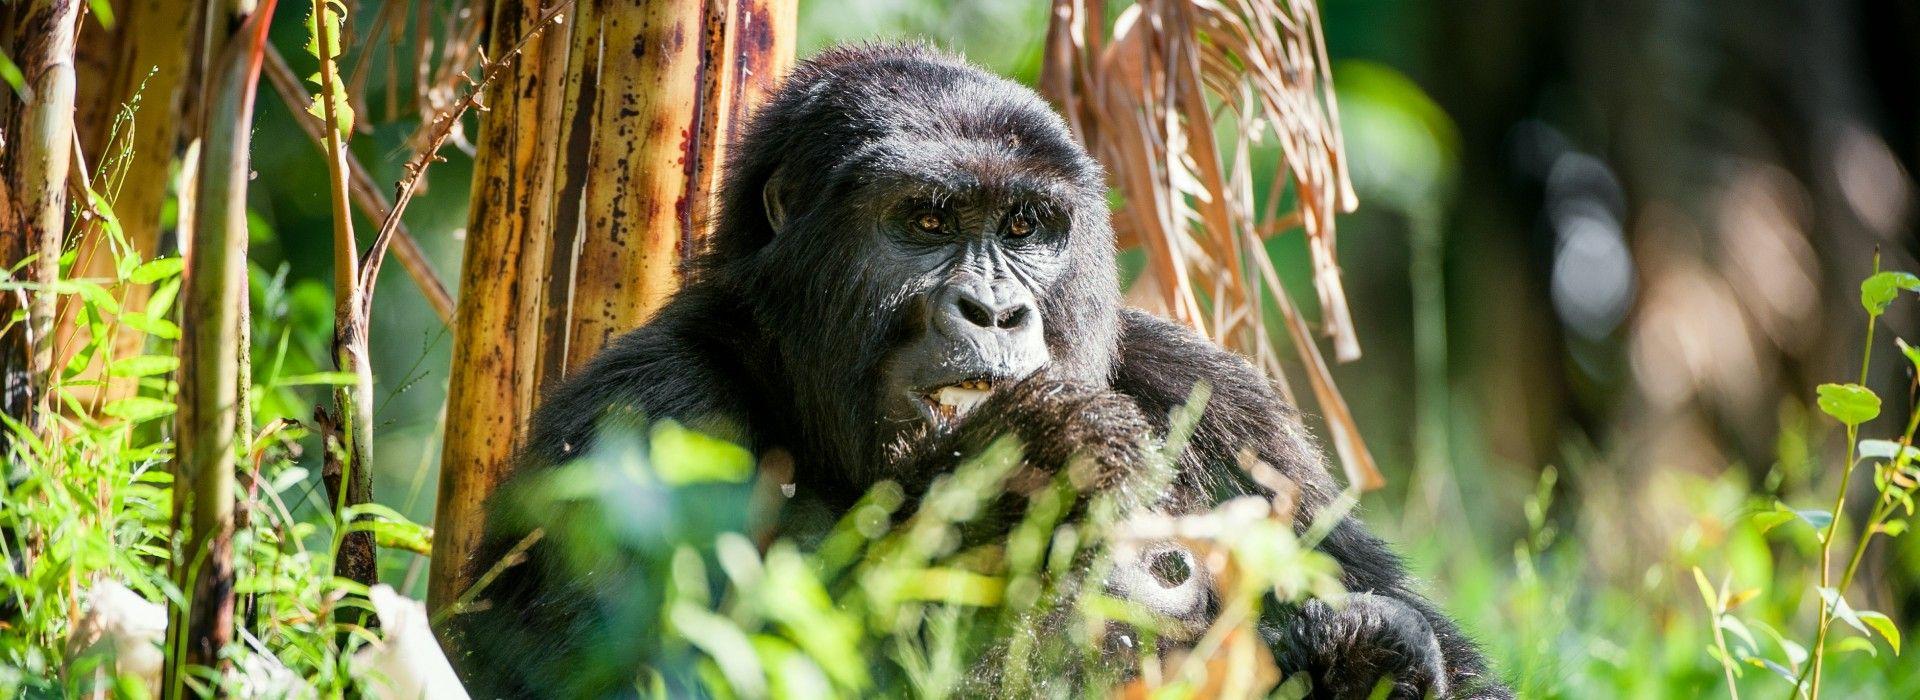 Gorilla and chimpanzee tracking Tours in Uganda